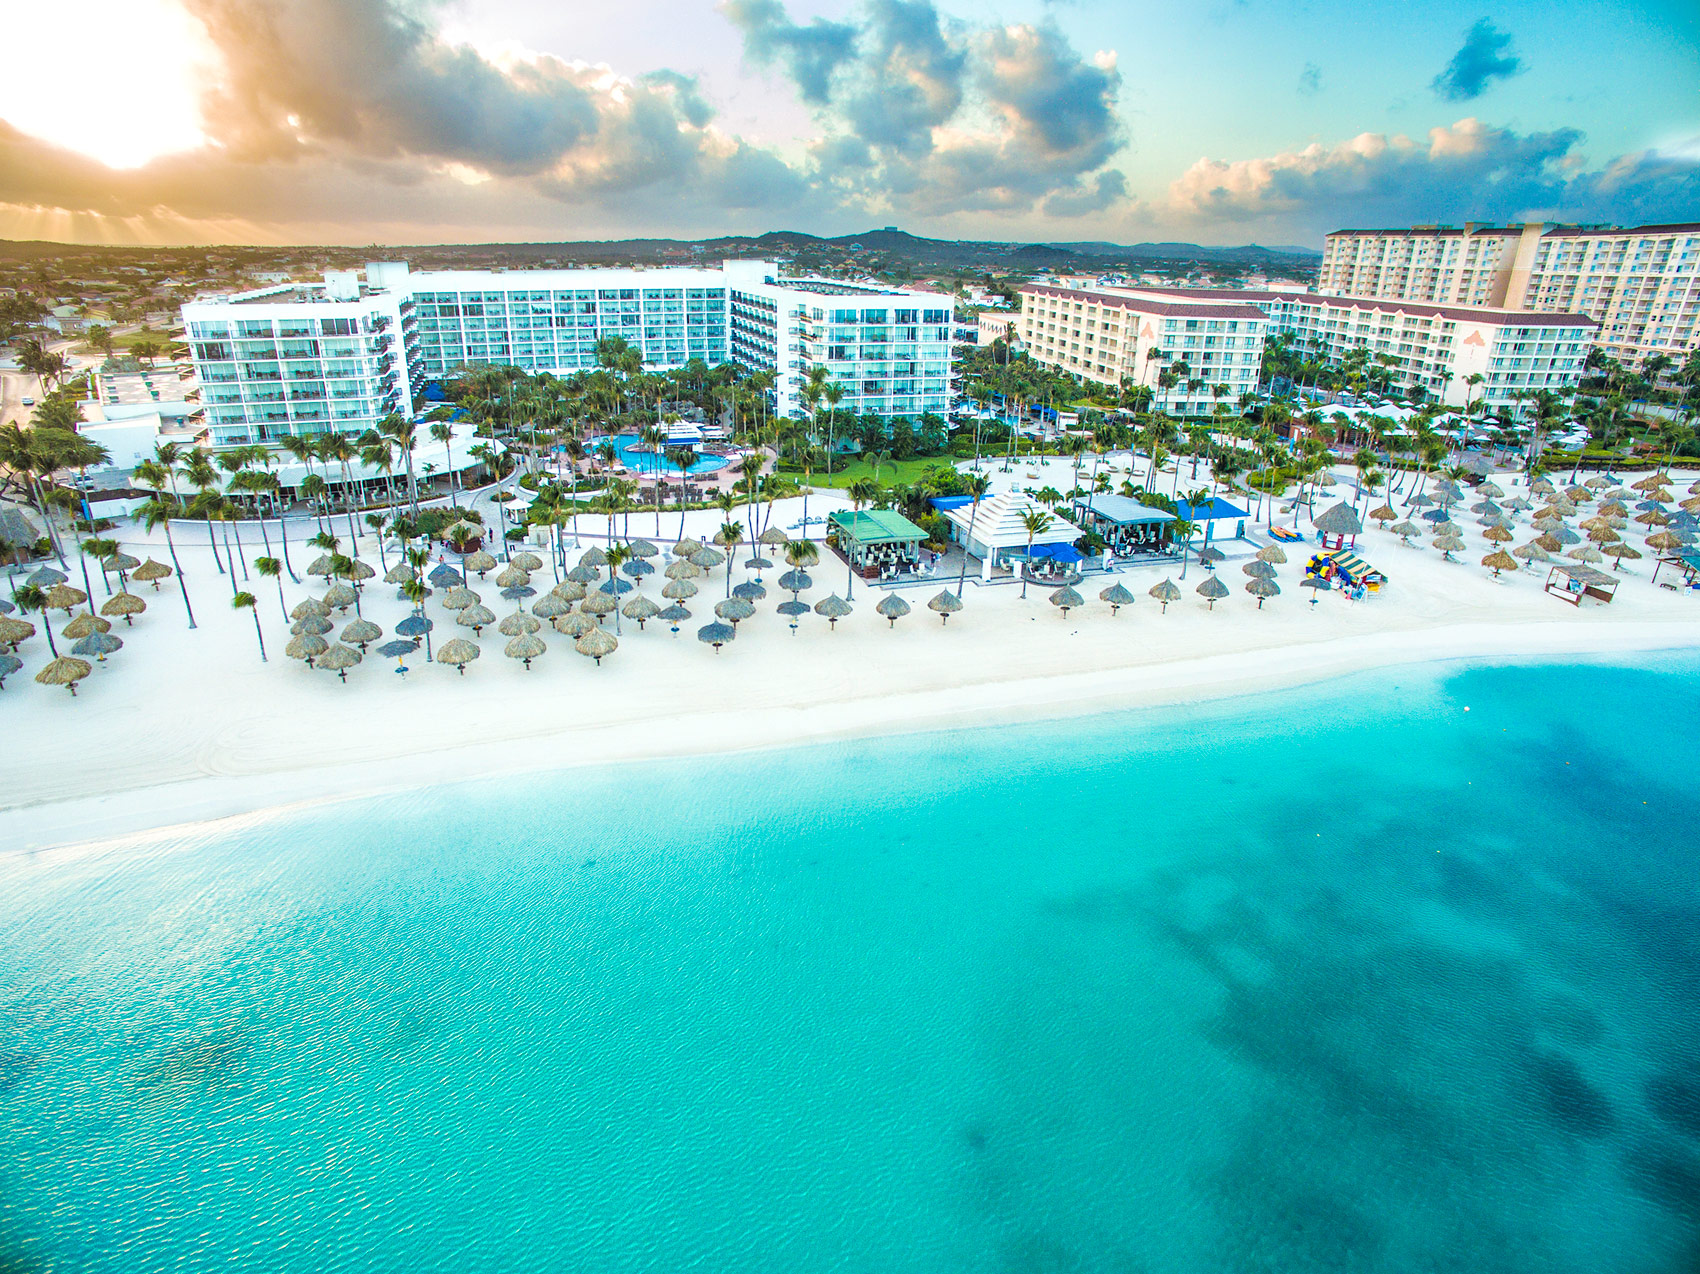 Amazing Aruba Celebrates 10th Caribbean Sea Jazz Festival